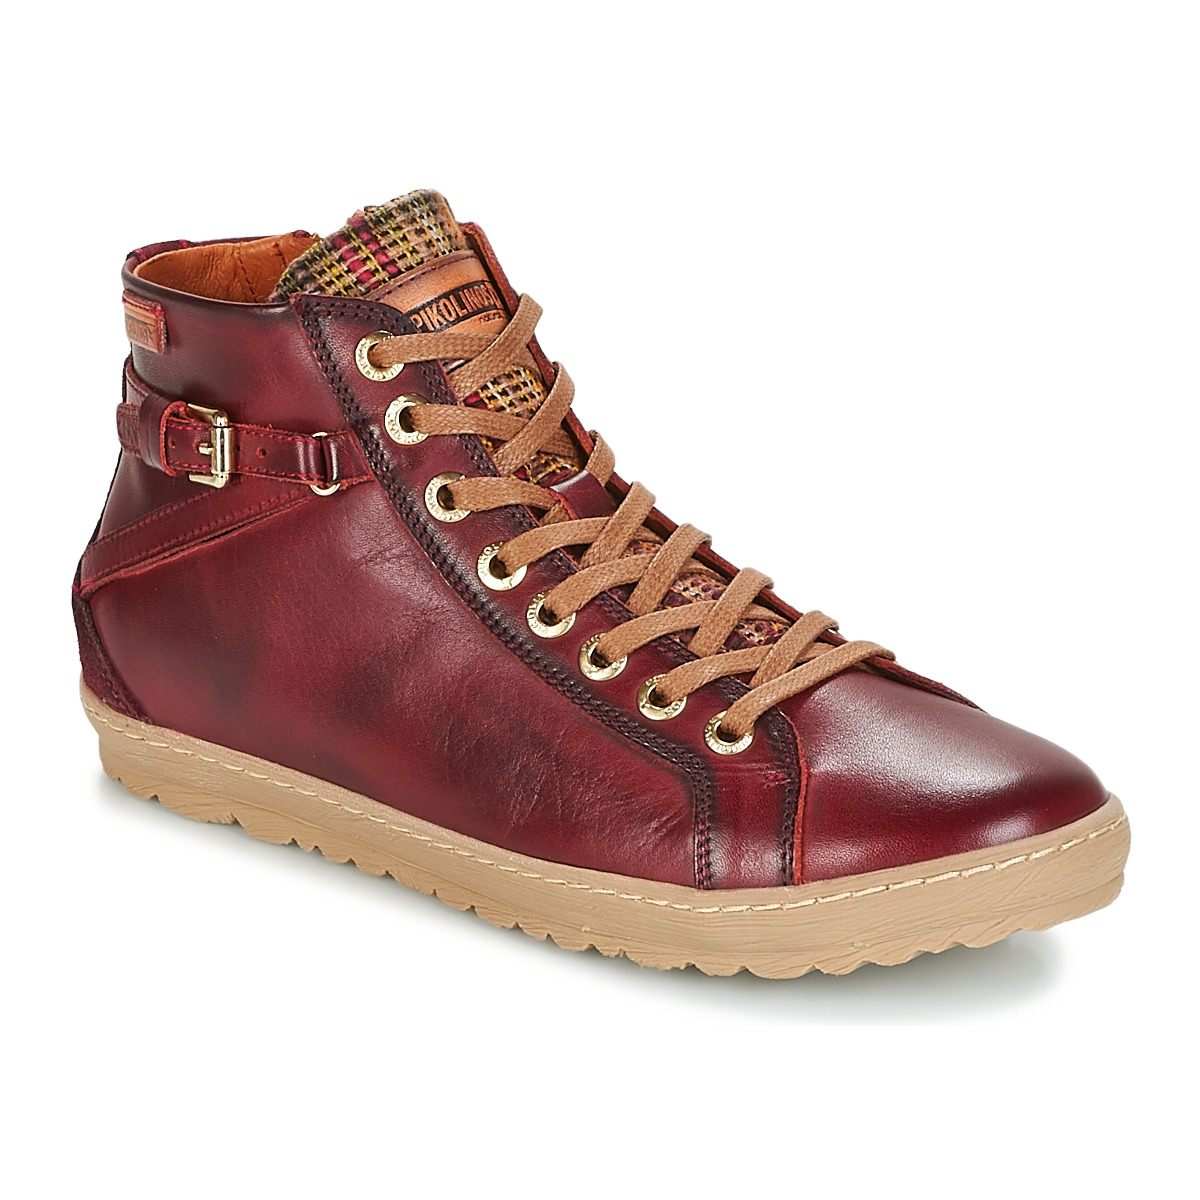 Pikolinos LAGOS 901 Bordeaux - Kostenloser Versand bei Spartoode ! - Schuhe Sneaker High Damen 119,00 €